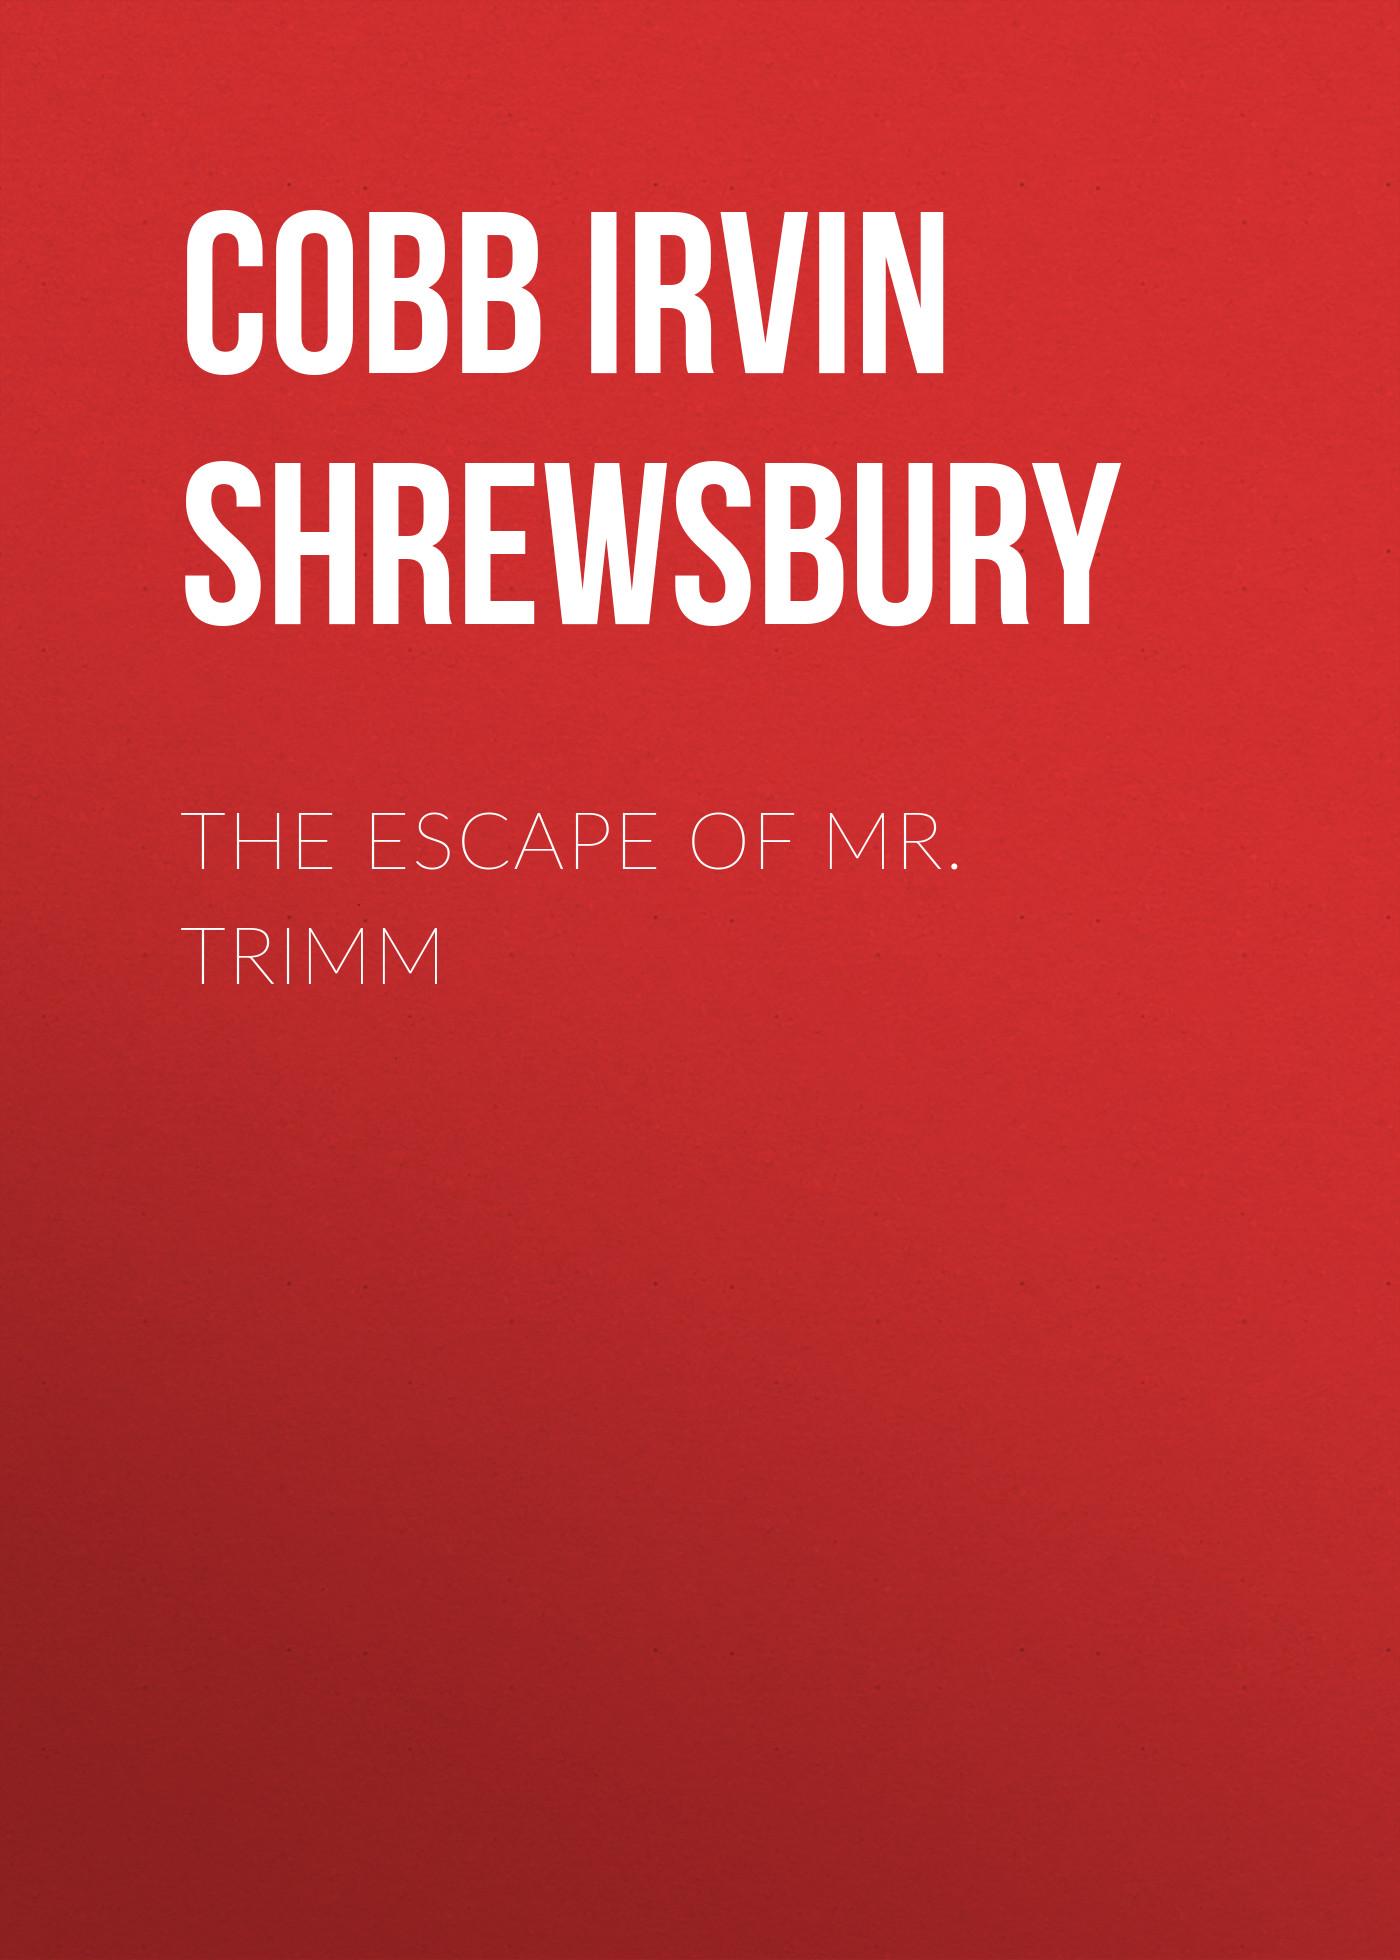 Cobb Irvin Shrewsbury The Escape of Mr. Trimm vincent cobb revelation